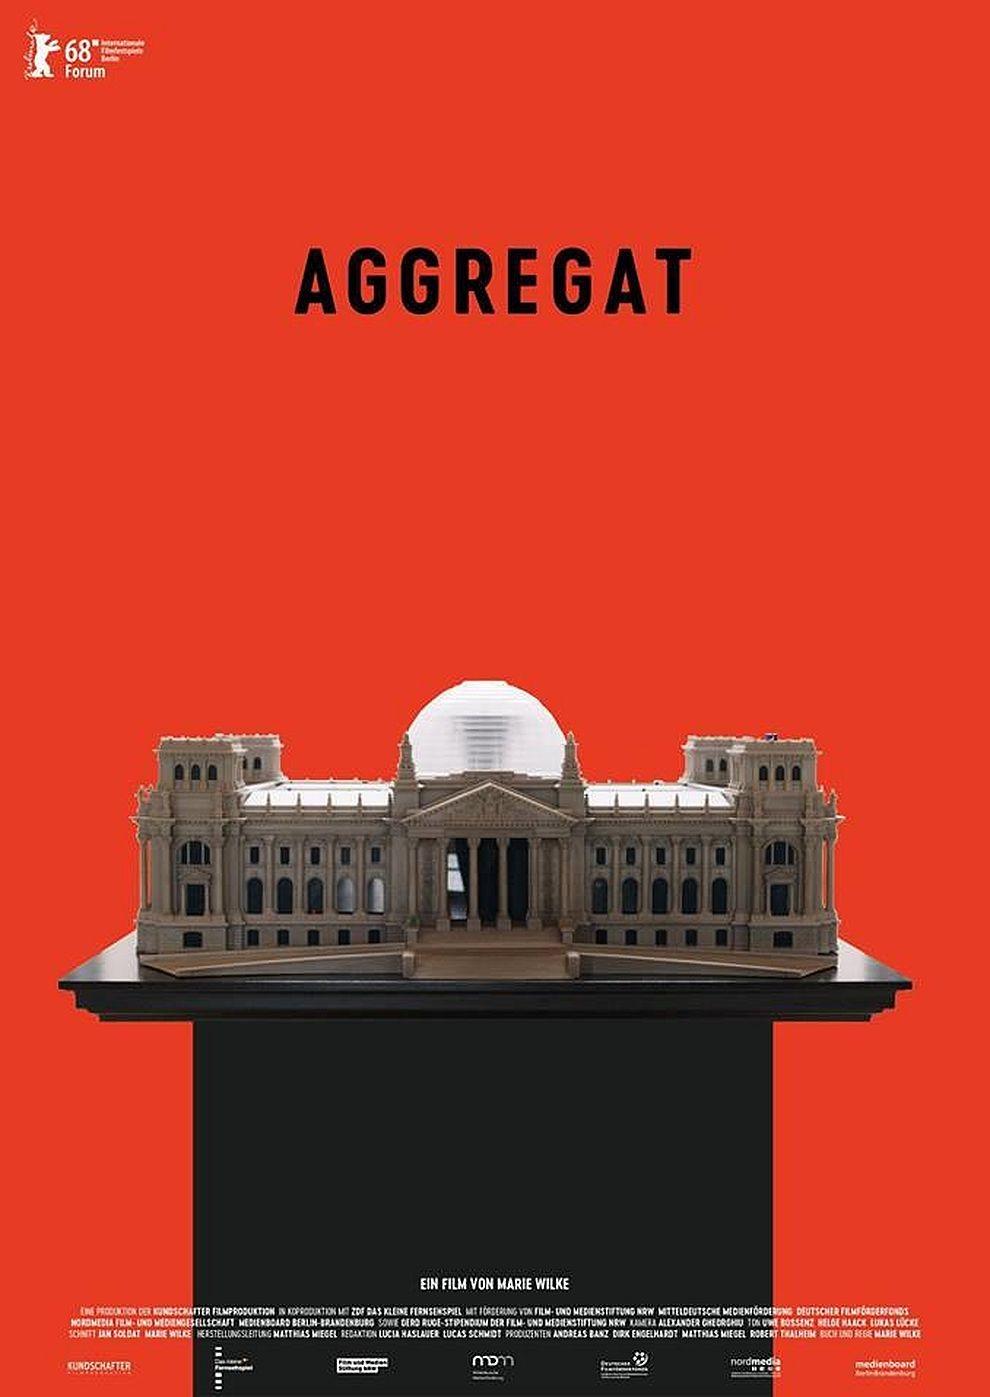 Aggregat (Poster)